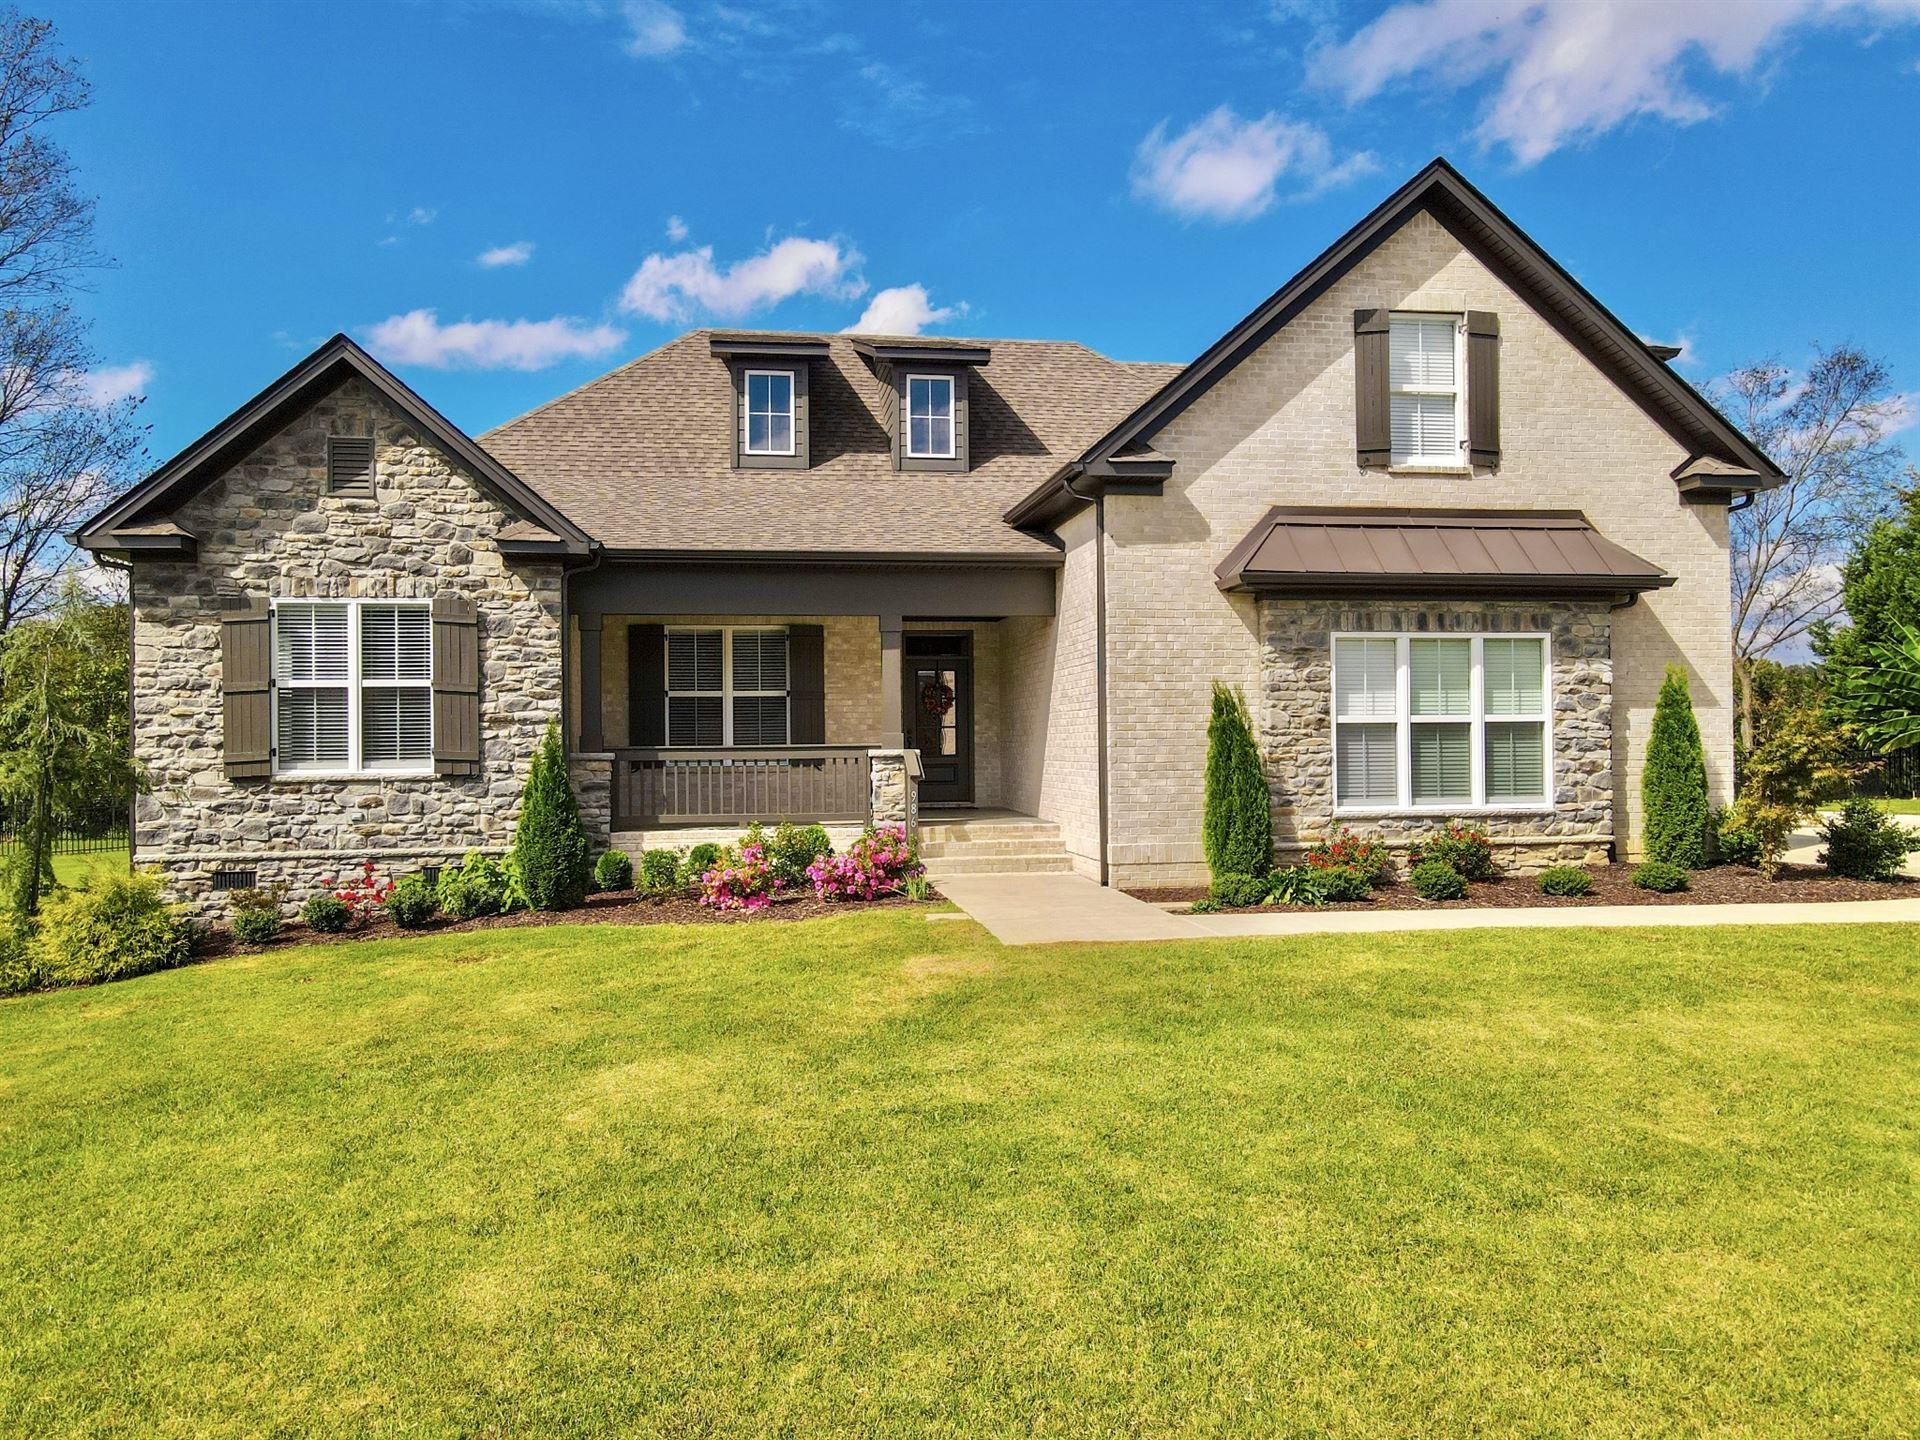 986 Nashs Nook, Columbia, TN 38401 - MLS#: 2299832